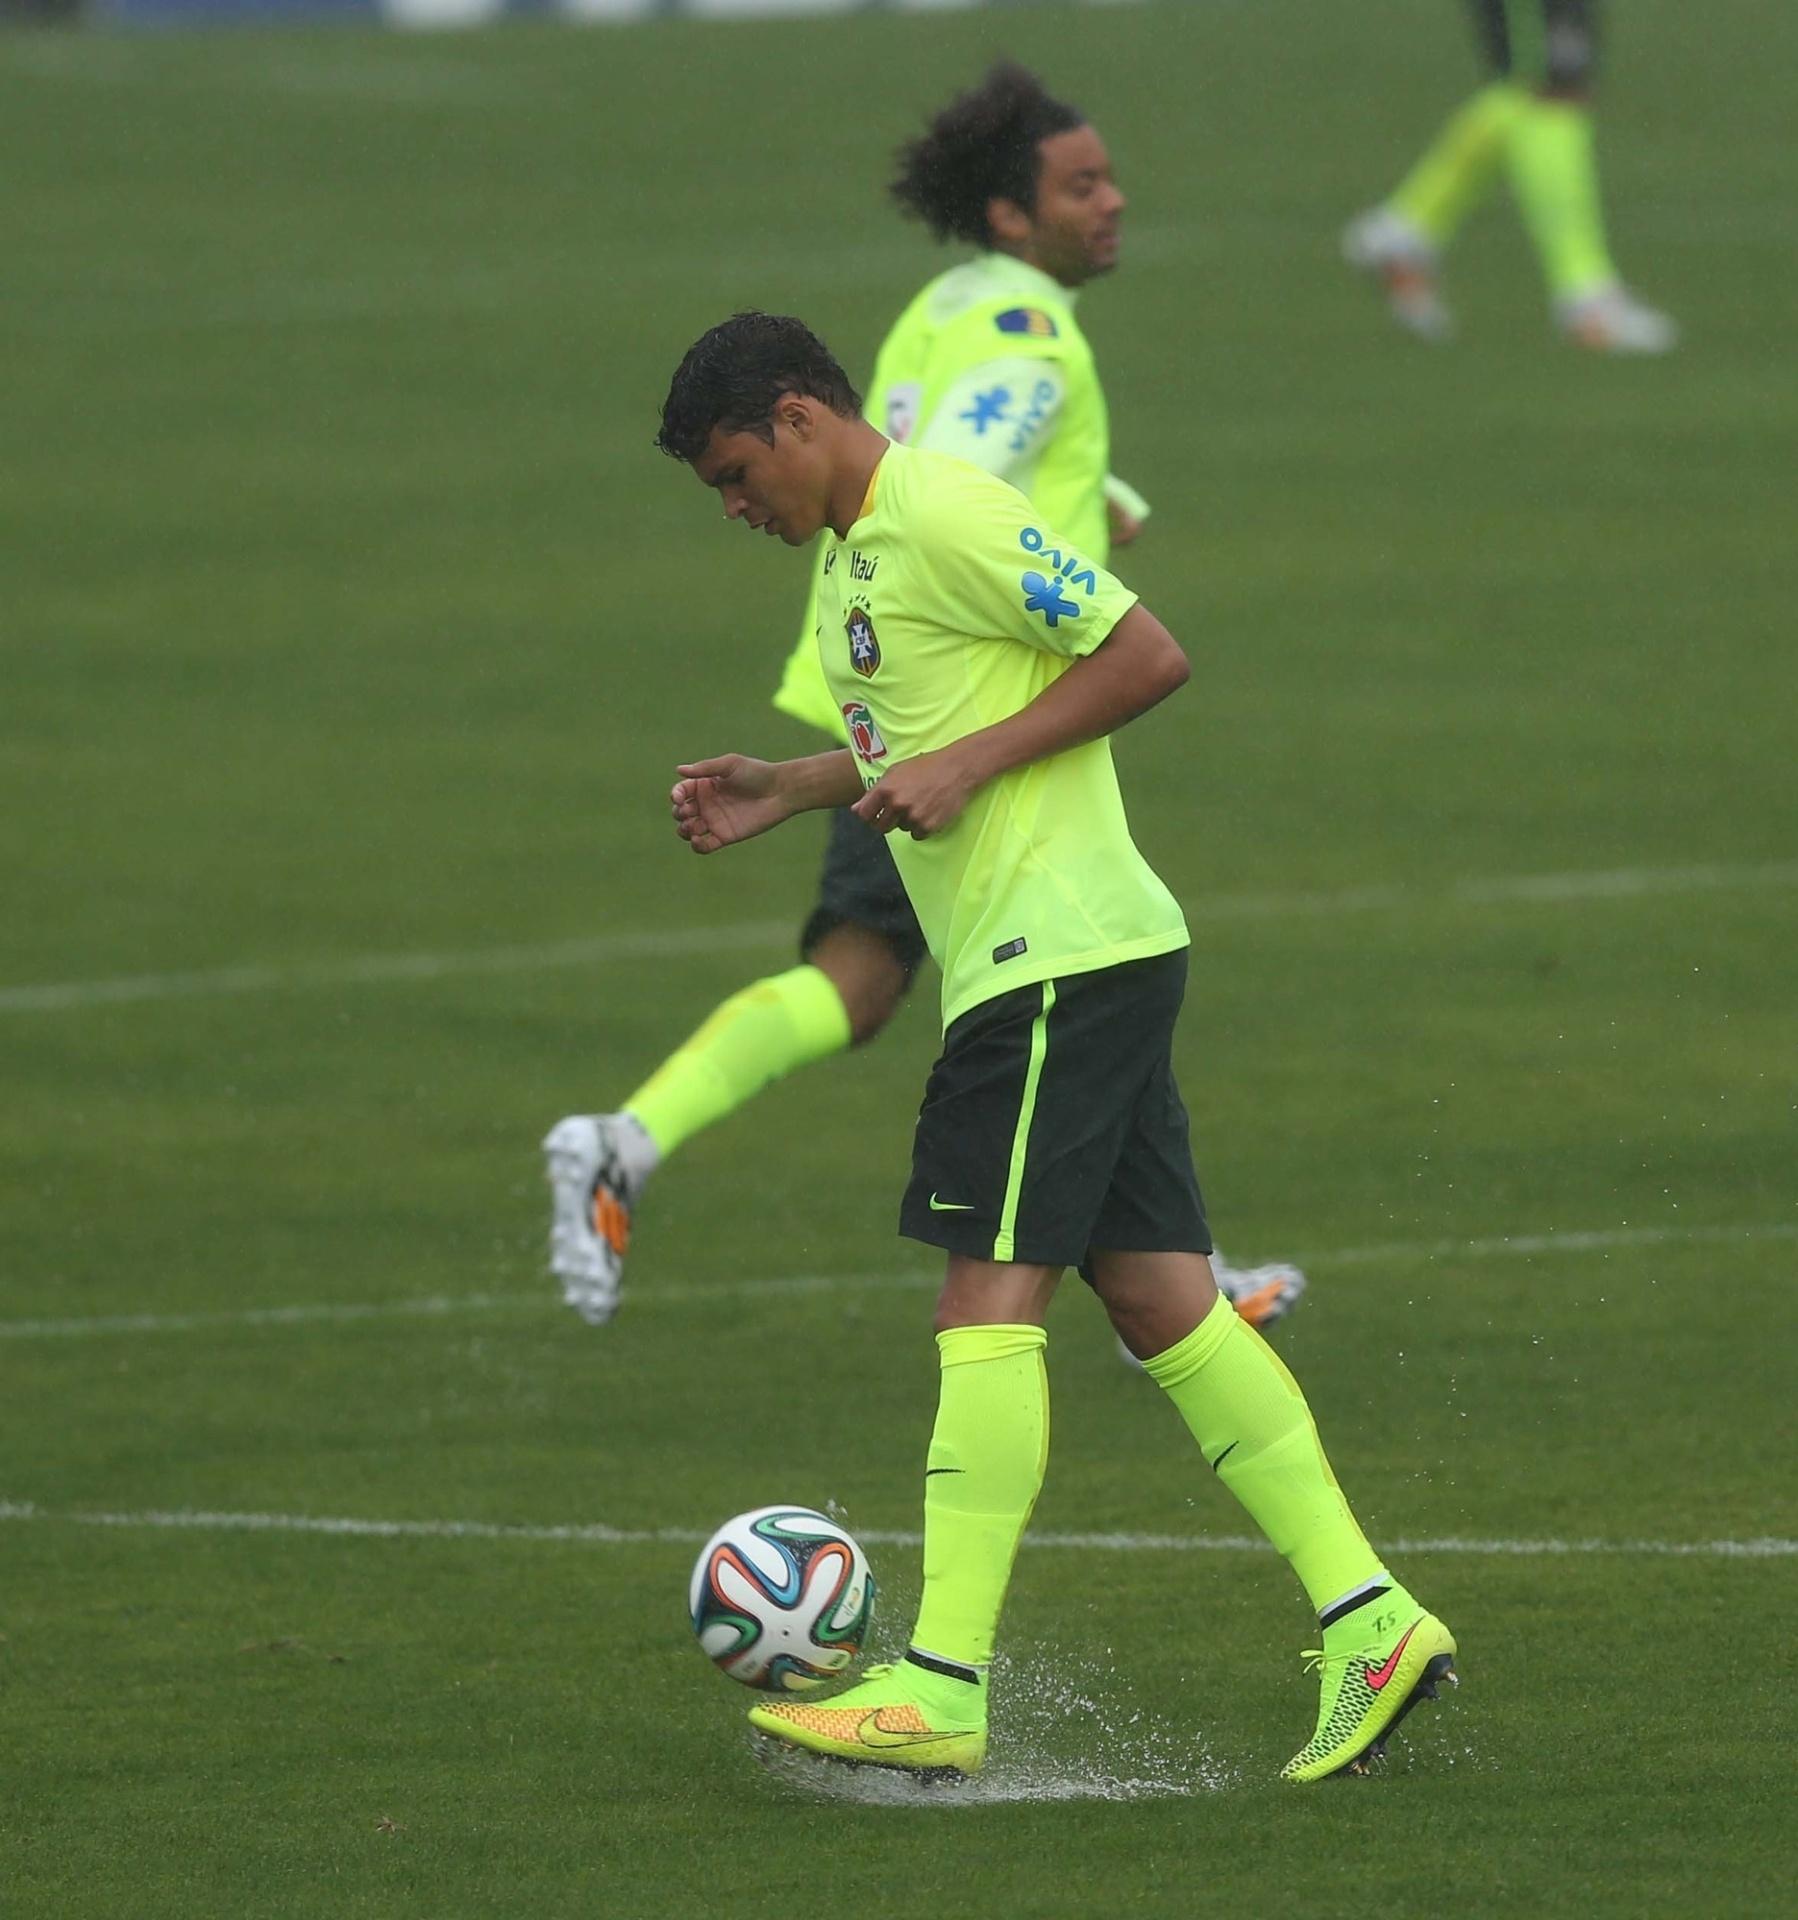 10. jun. 2014 - Seleção brasileira treina na Granja Comary